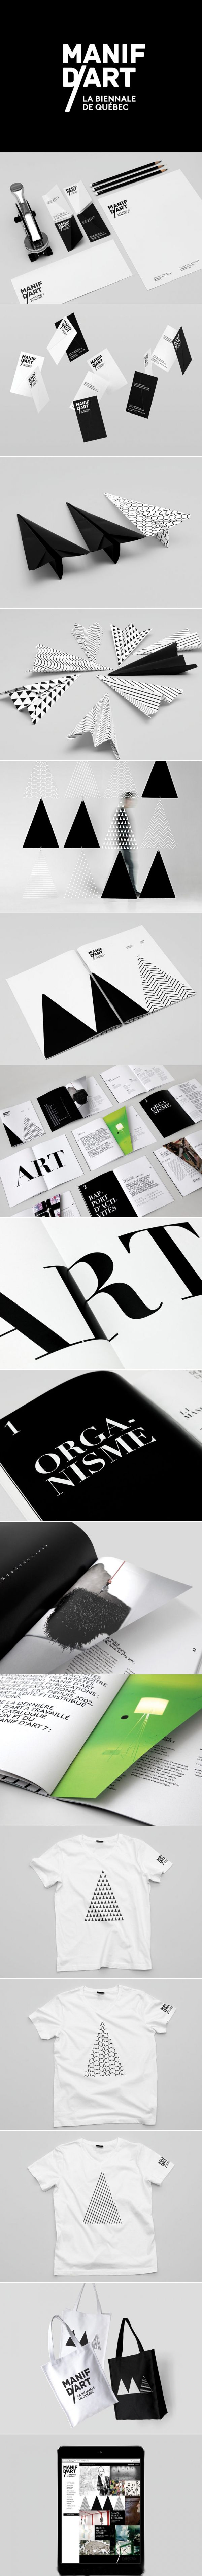 Manif d'Art |Branding |lg2boutique